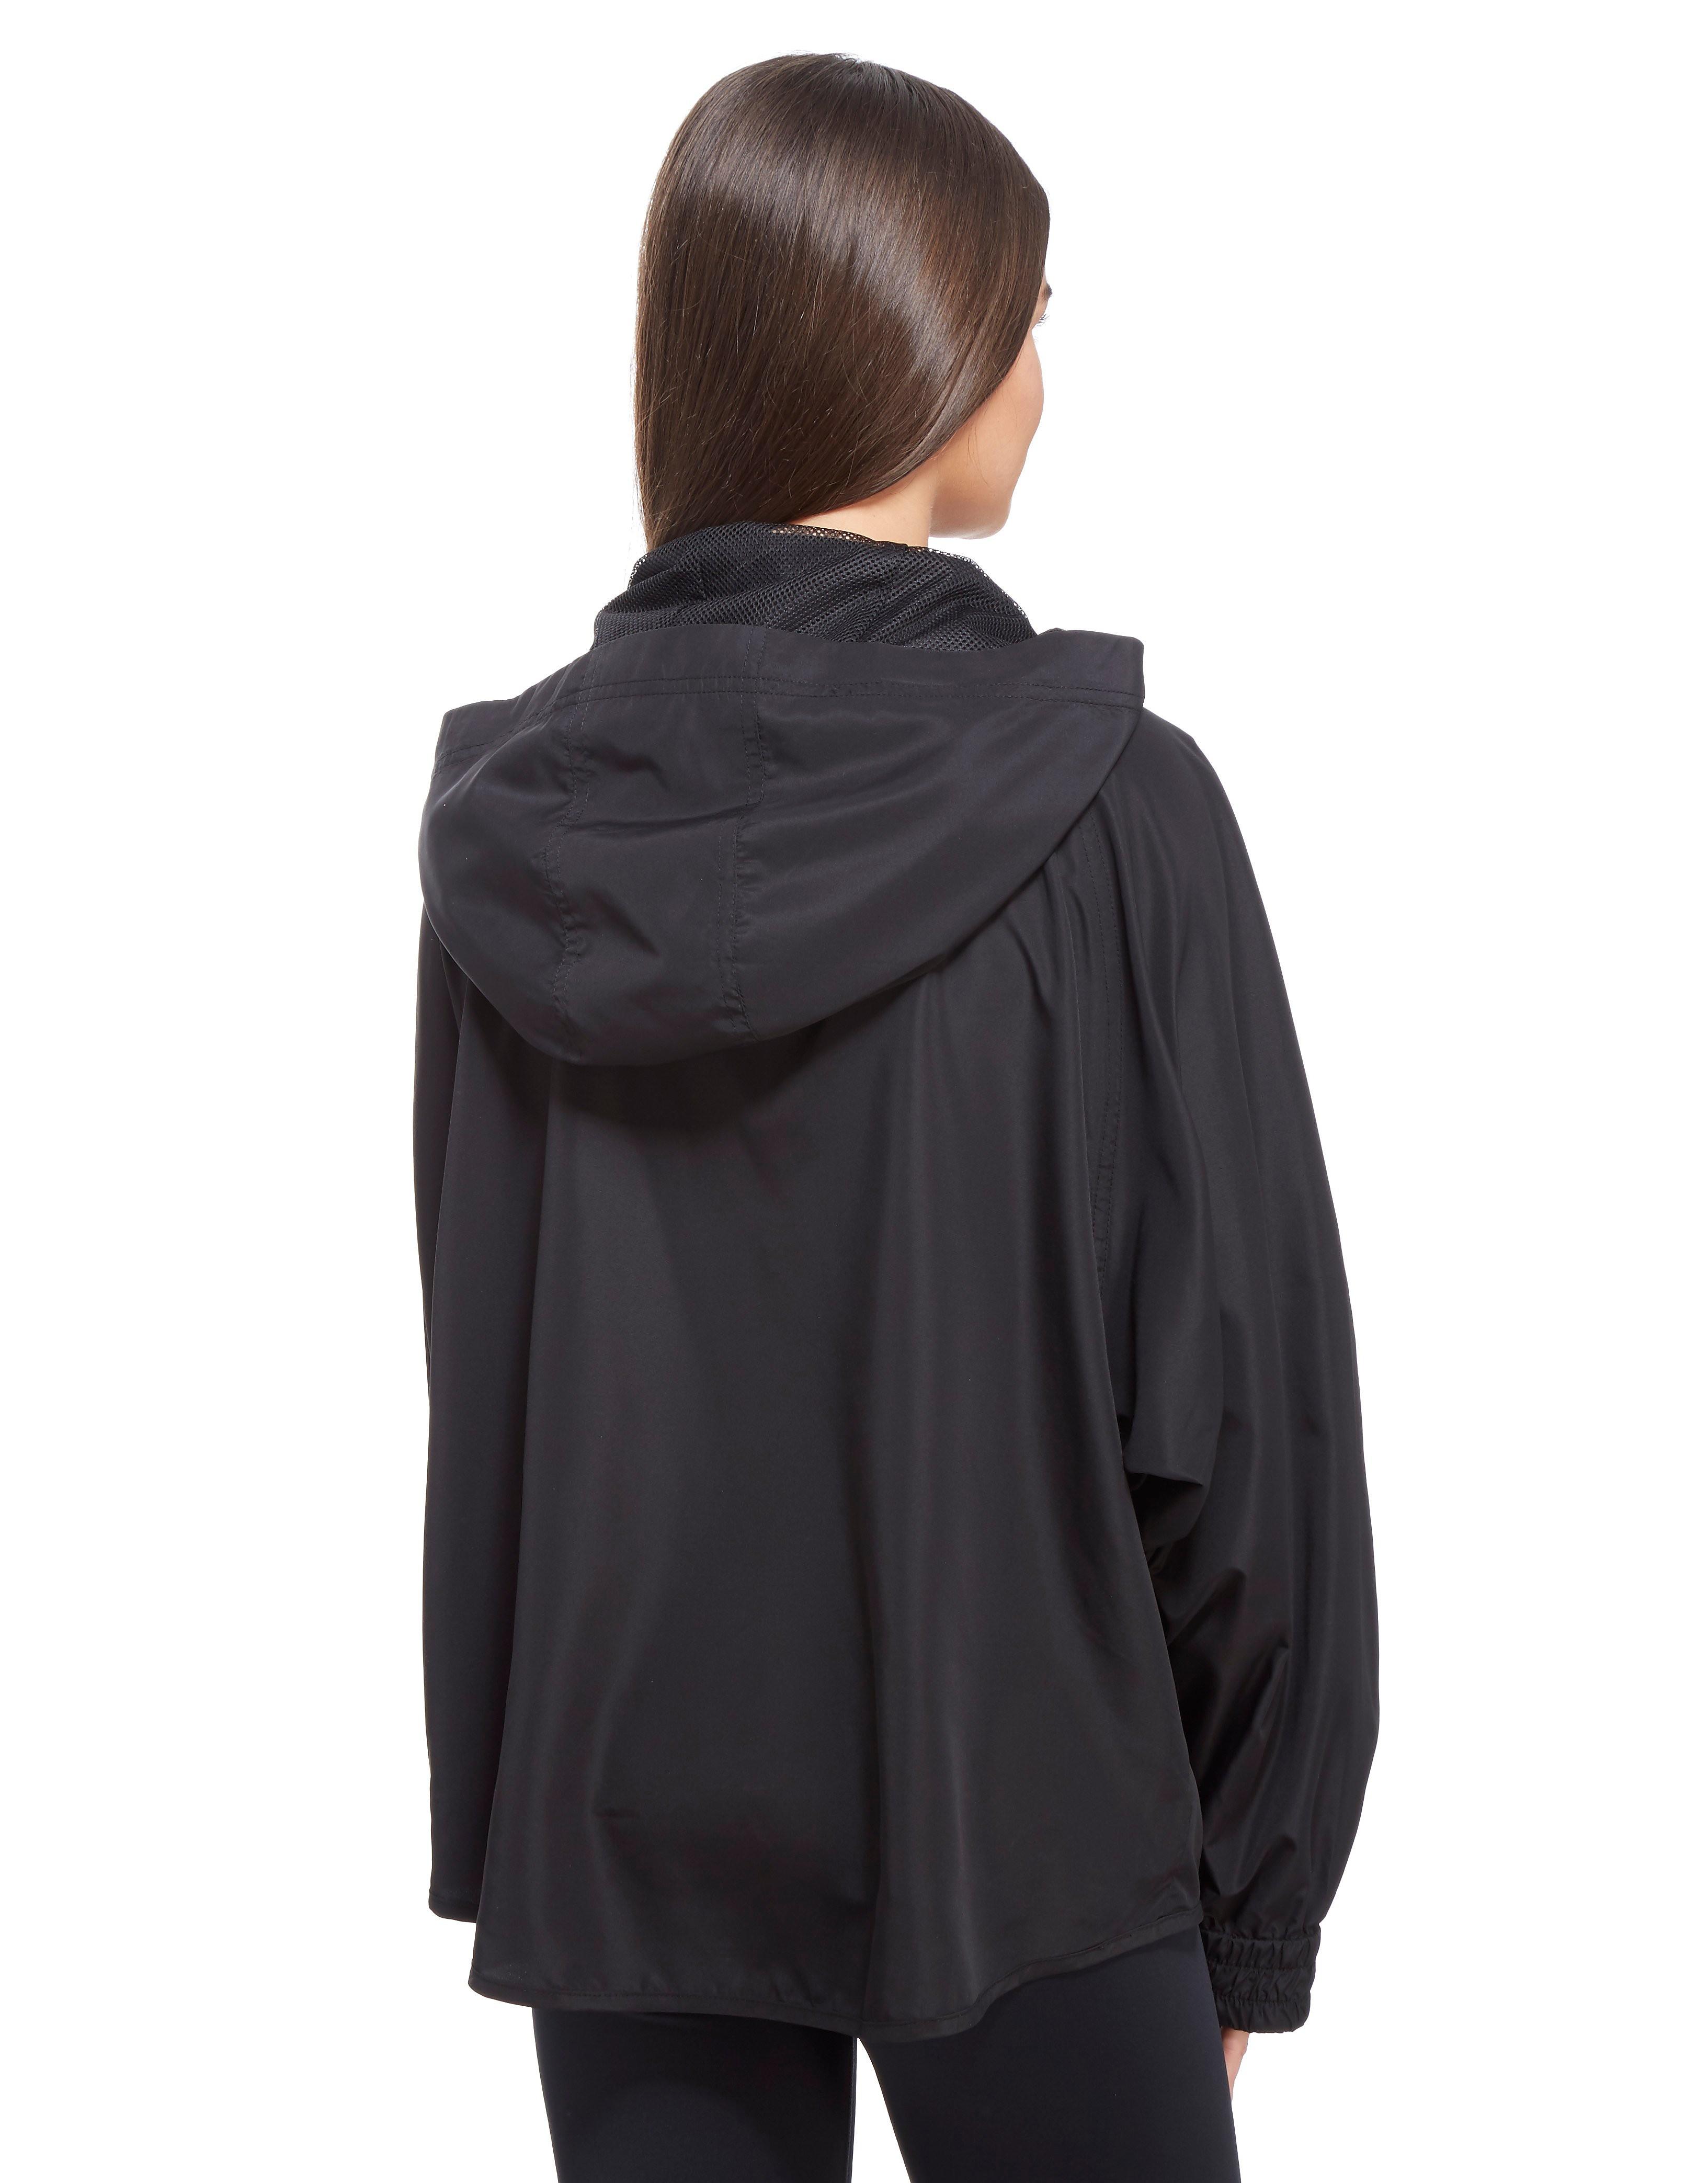 IVY PARK Hooded Zip Jacket